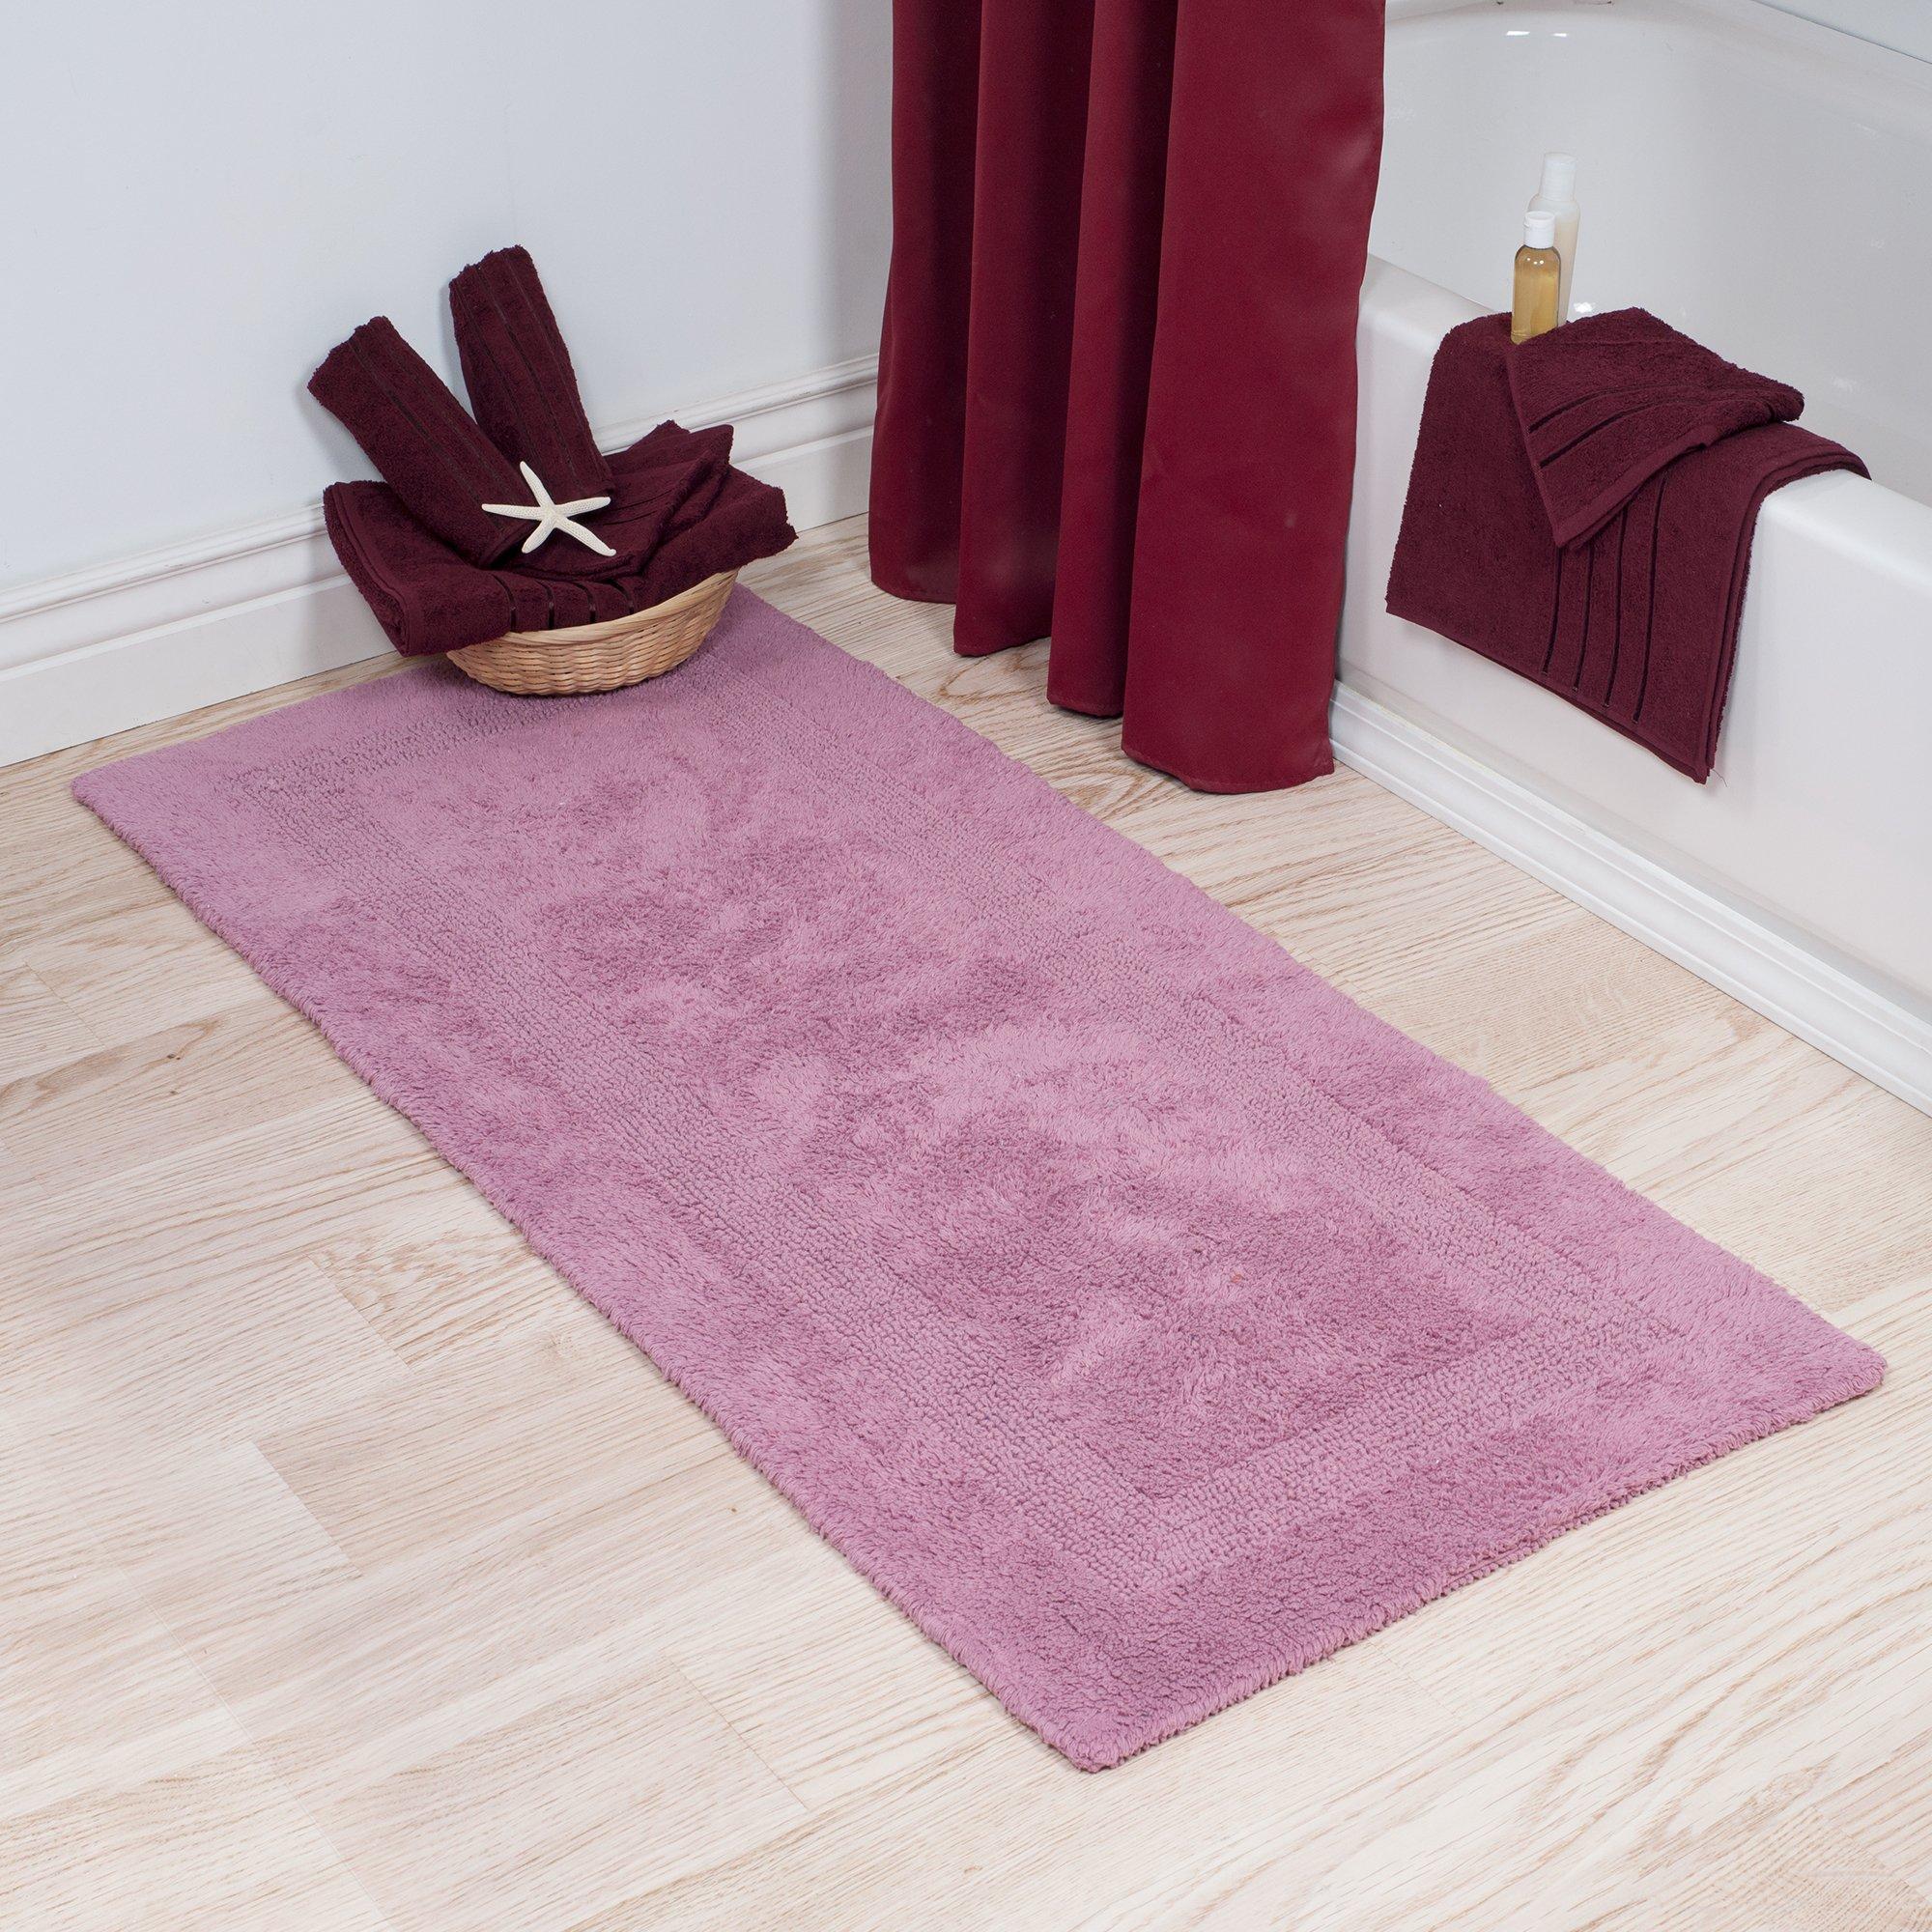 Lavish Home Cotton Bath Mat- Plush 100 Percent Cotton 24x60 Long Bathroom Runner- Reversible, Soft, Absorbent, and Machine Washable Rug (Rose)